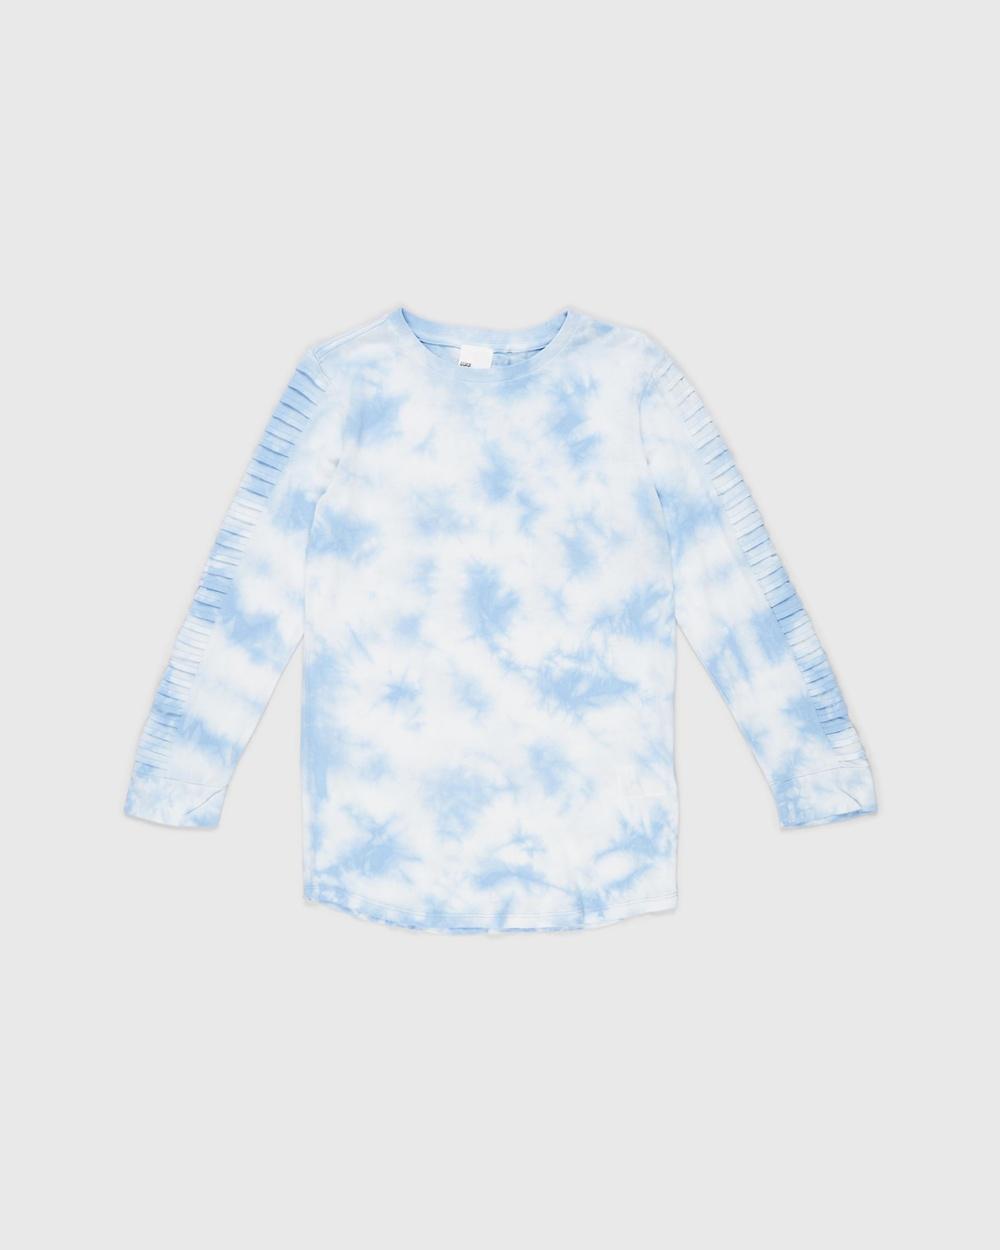 Free by Cotton On Moto Long Line Tee Teens T-Shirts & Singlets Dusk Blue Tie Dye Australia